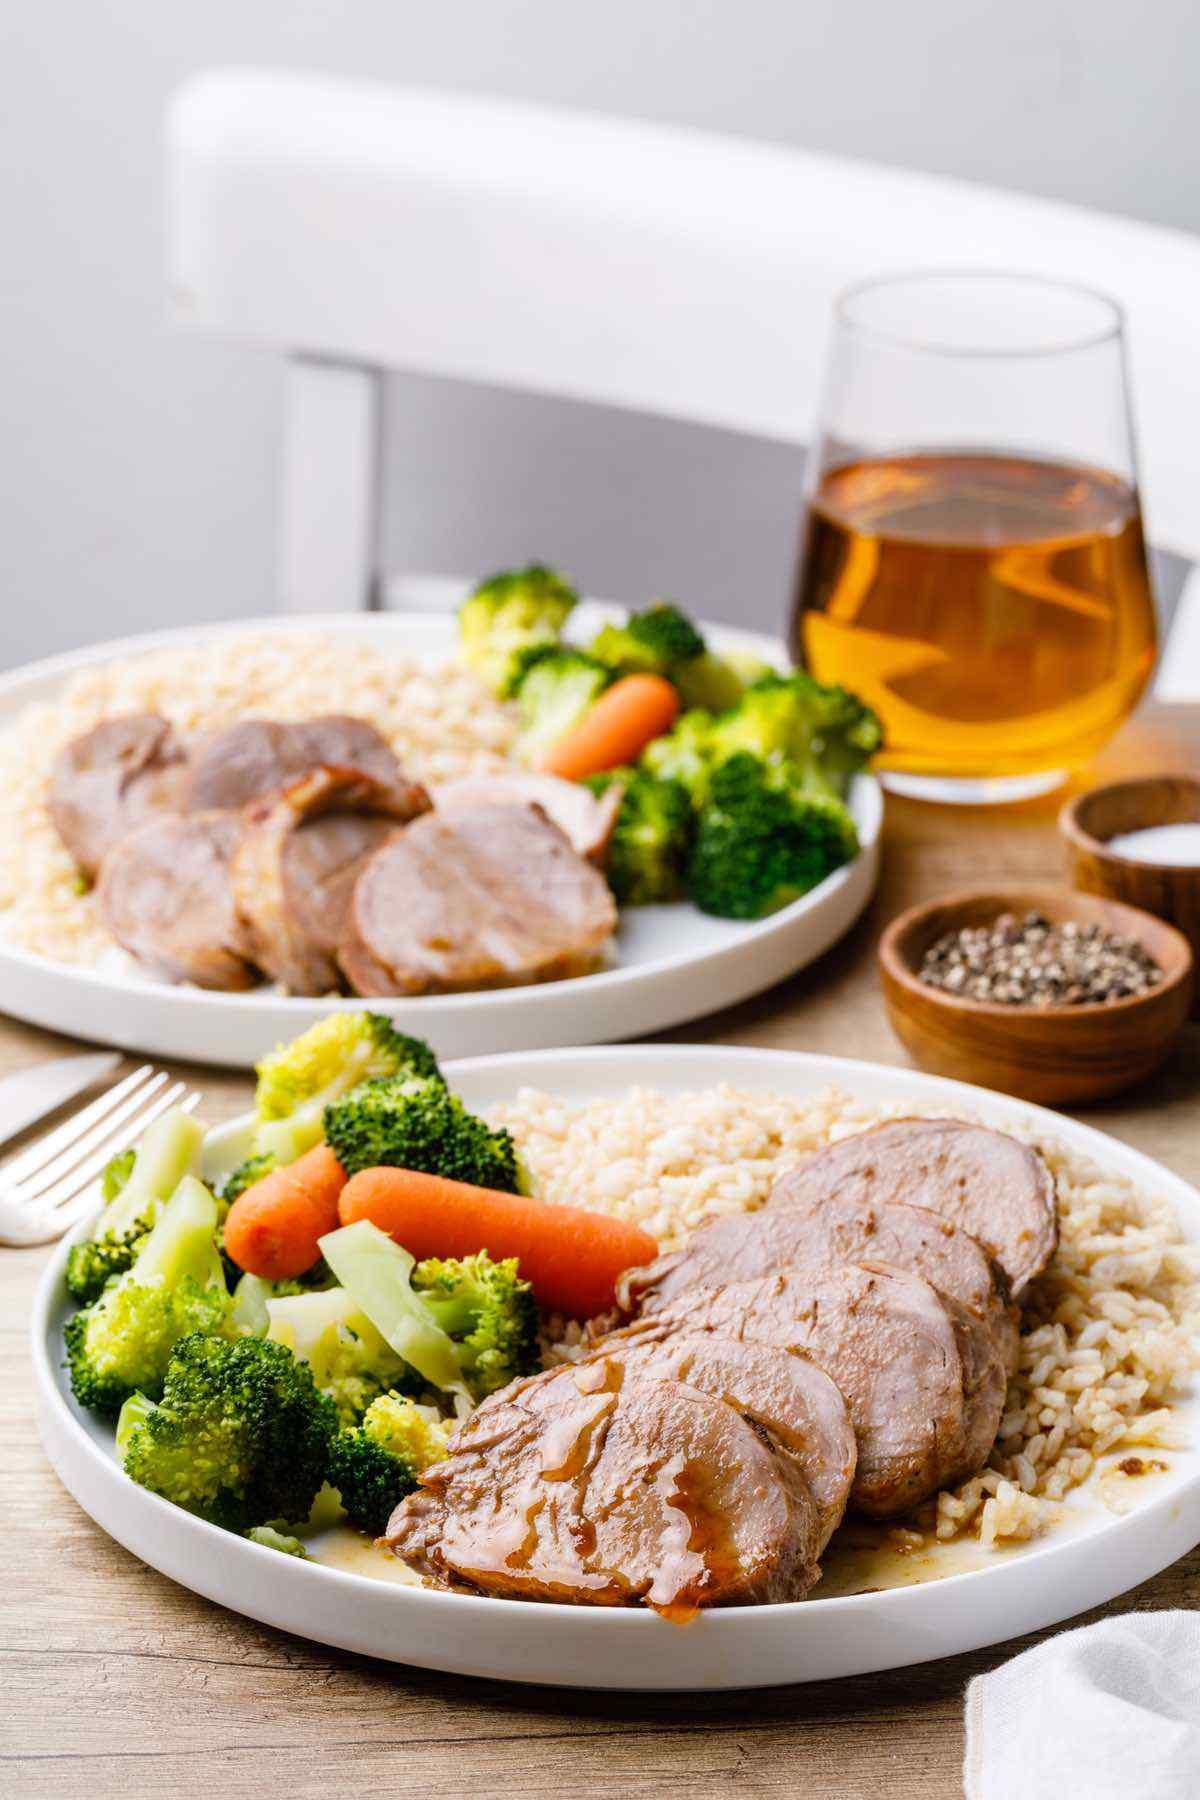 Apple Cider Vinegar Instant Pot Pork Tenderloin